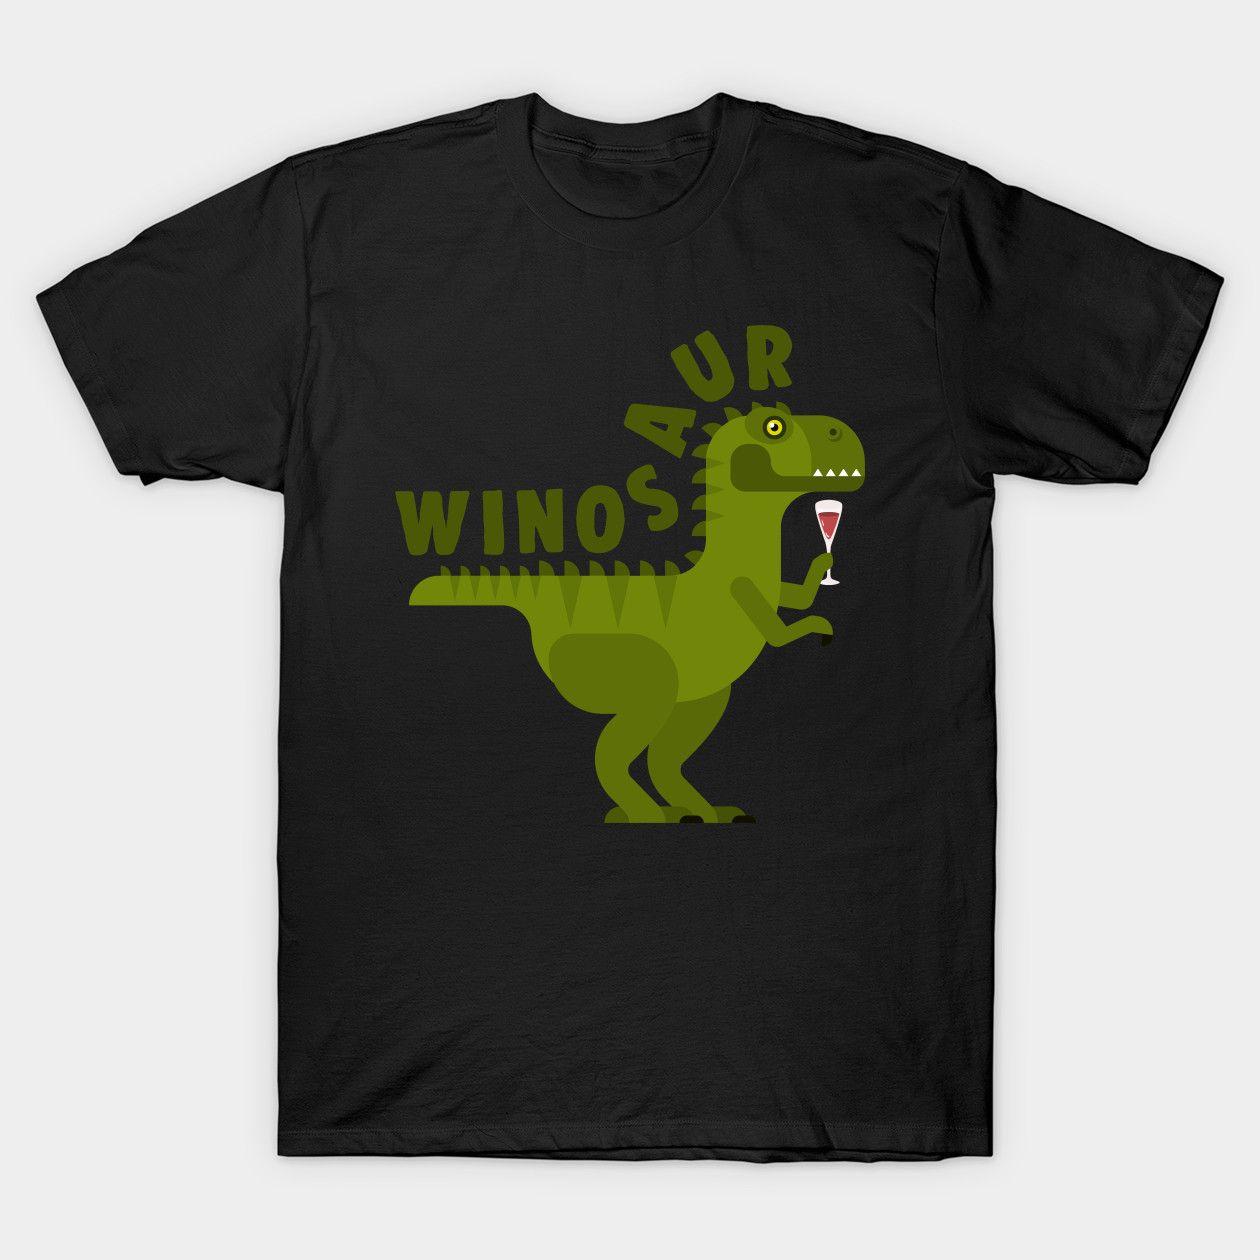 Winosaur Wine Lovers Dinosaur Prehistoric Creature Wild Animals dinosaurs Classic T-Shirt #prehistoriccreatures